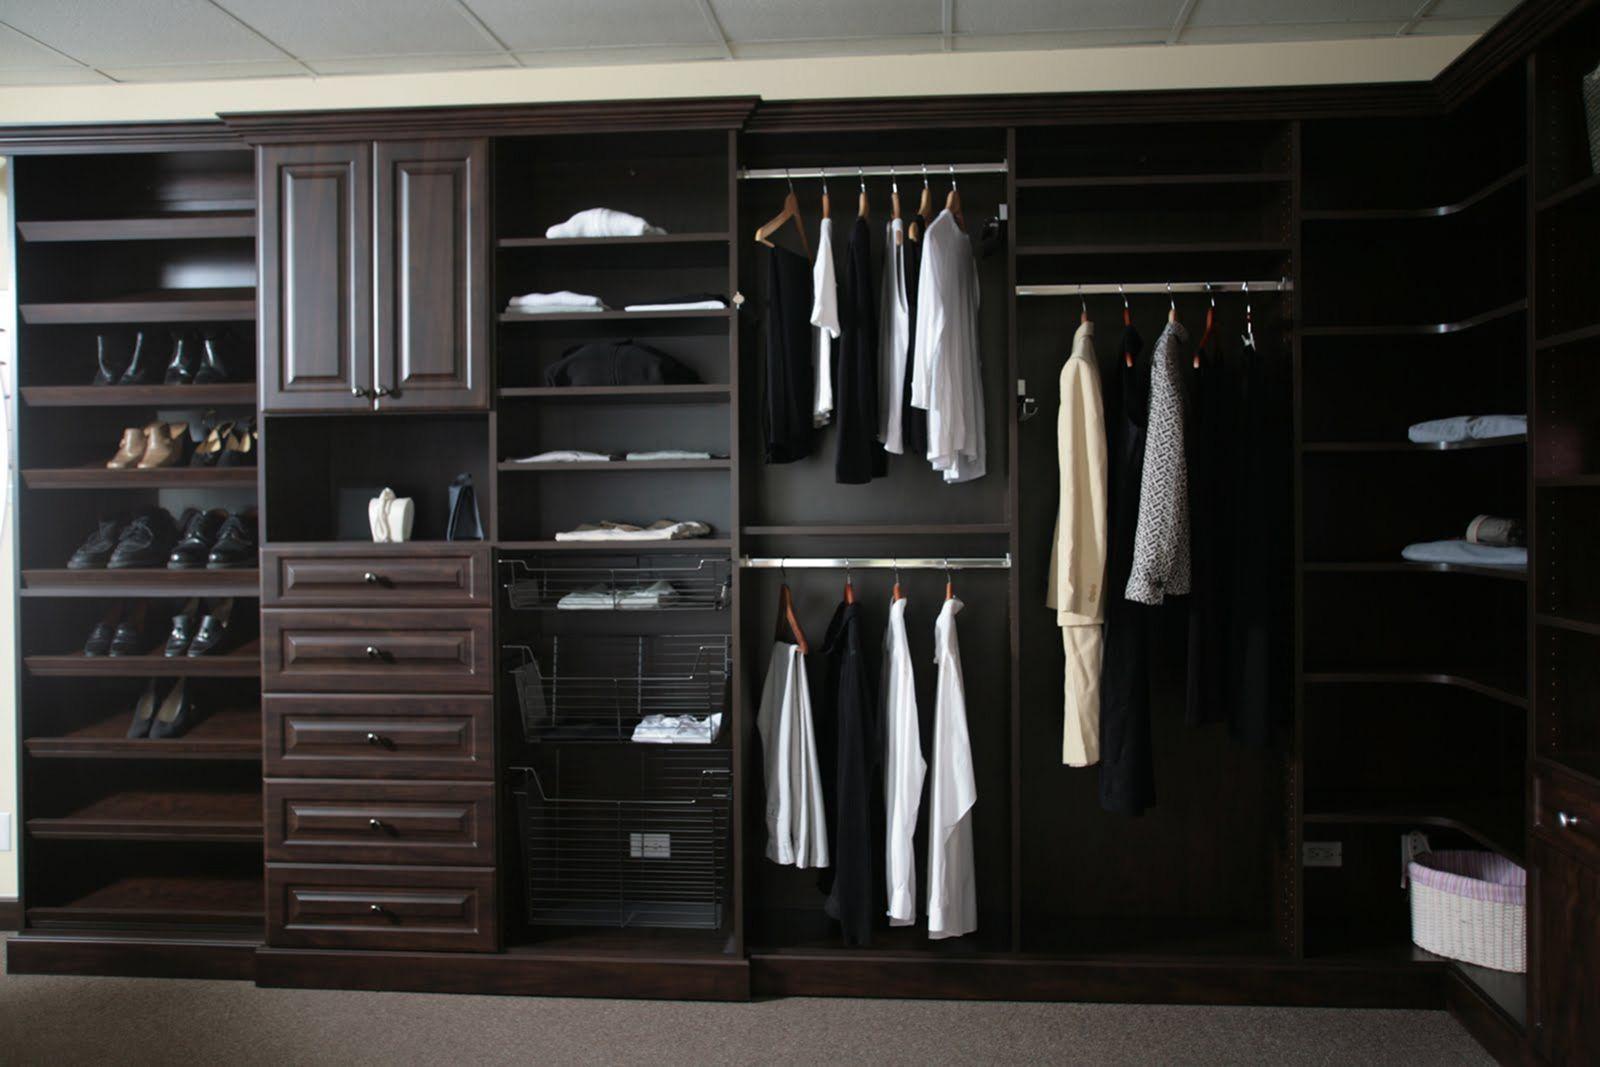 10 Excellent Black Wardrobe Design For Bedroom Ideas Closet Shelving Design Wardrobe Design Bedroom Closet Designs